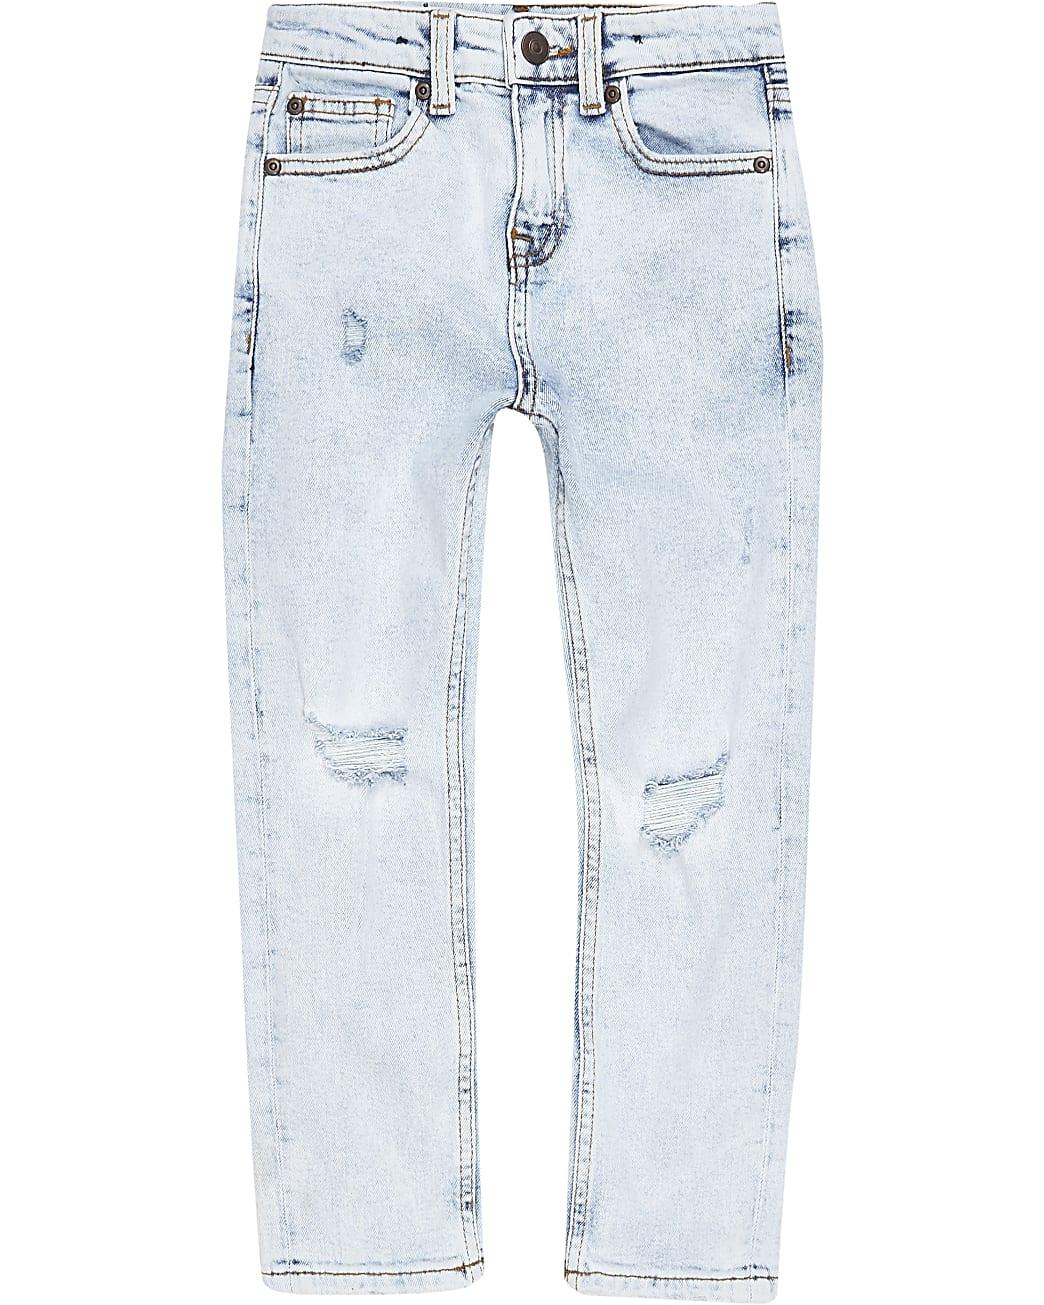 Boys light regular slim fit jeans